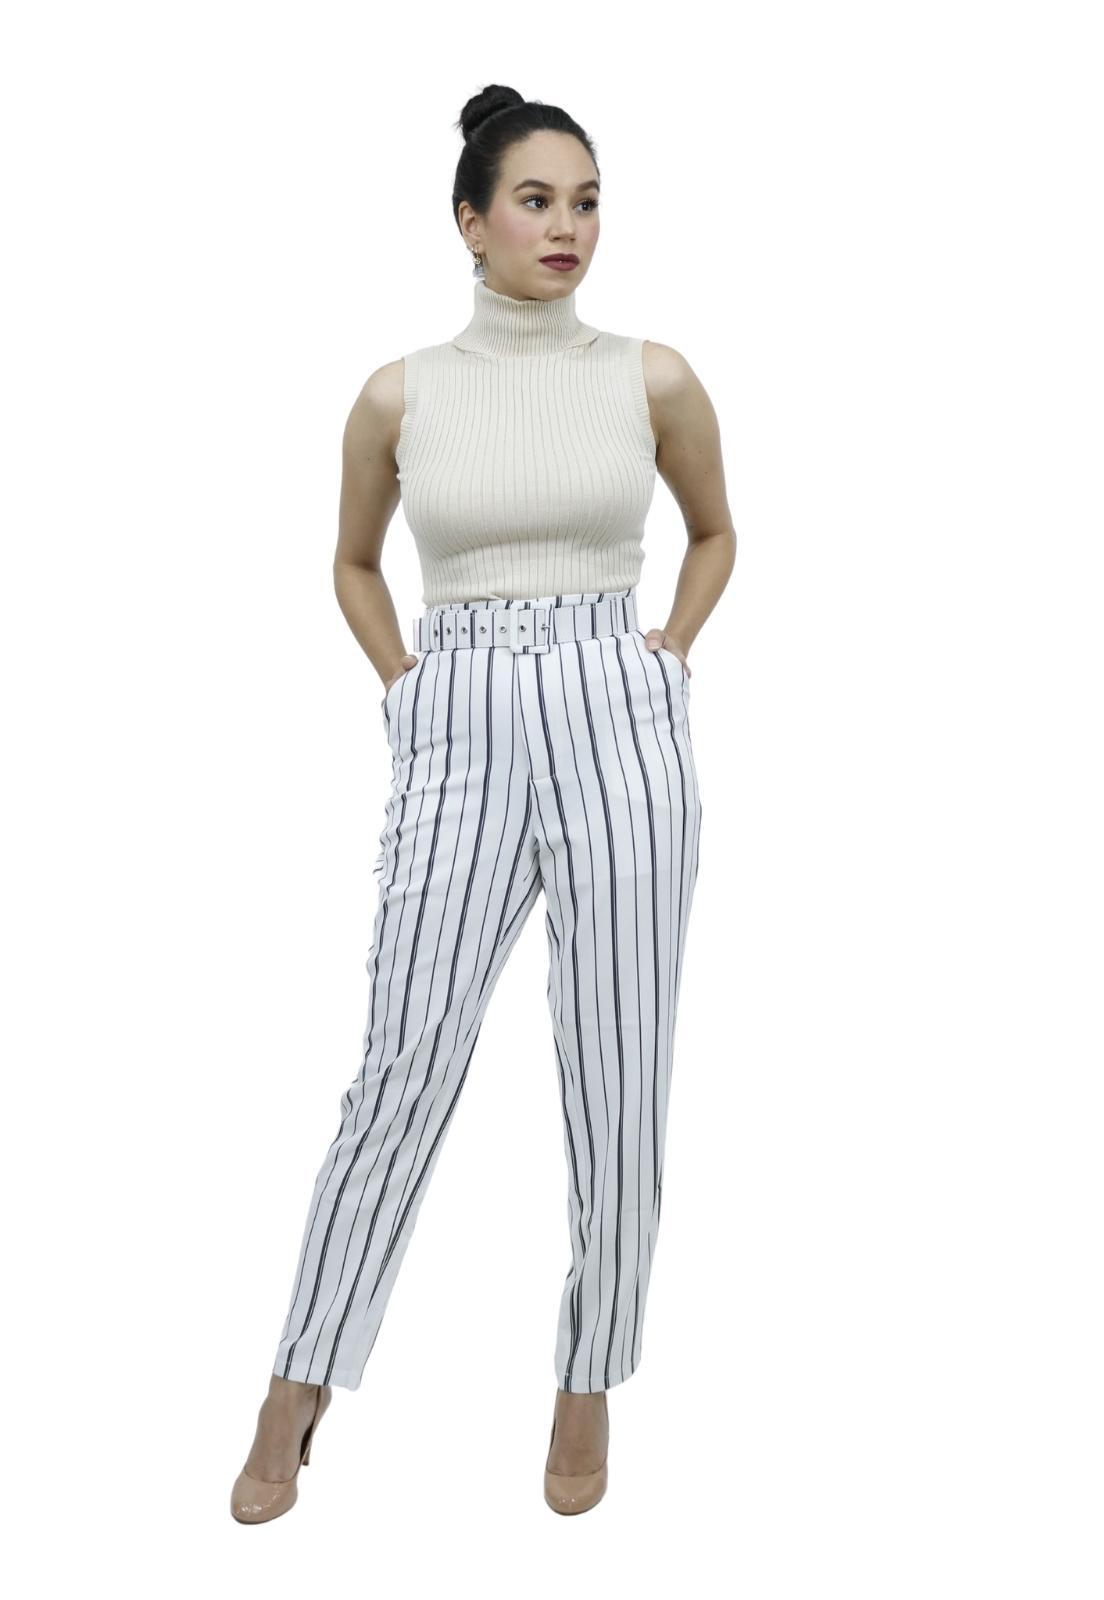 Calça Feminina Reta Alfaiataria Cintura Alta